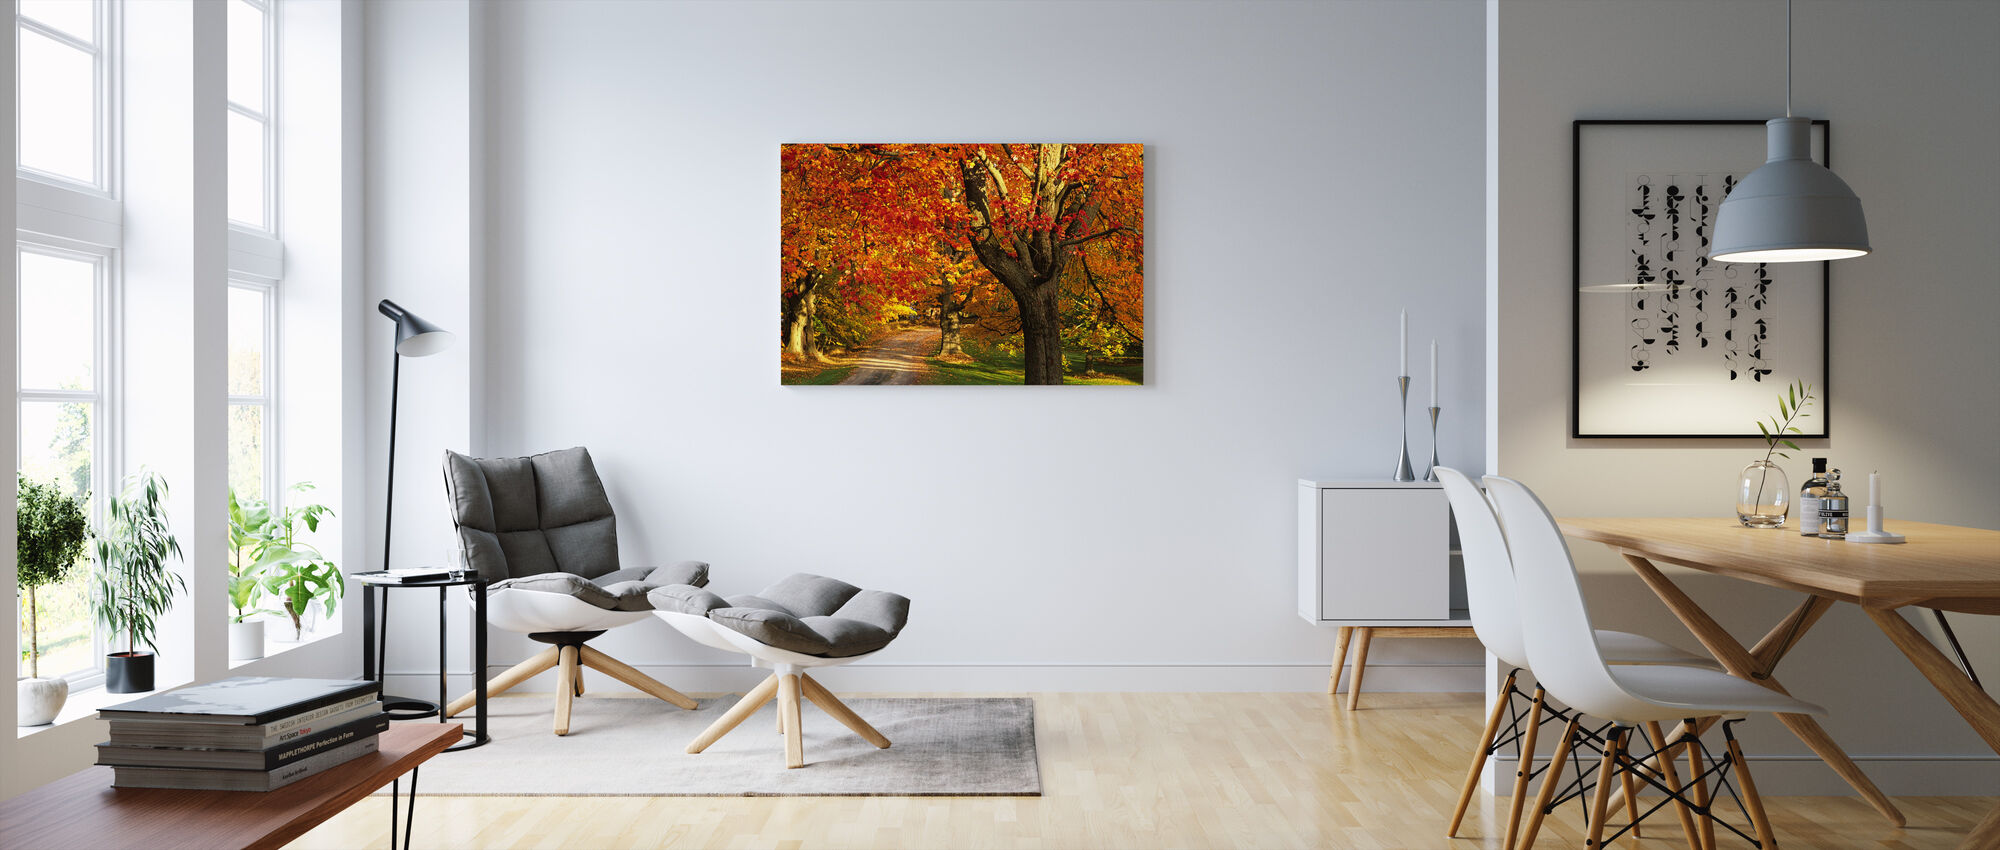 Golden Maple Tree - Canvas print - Living Room